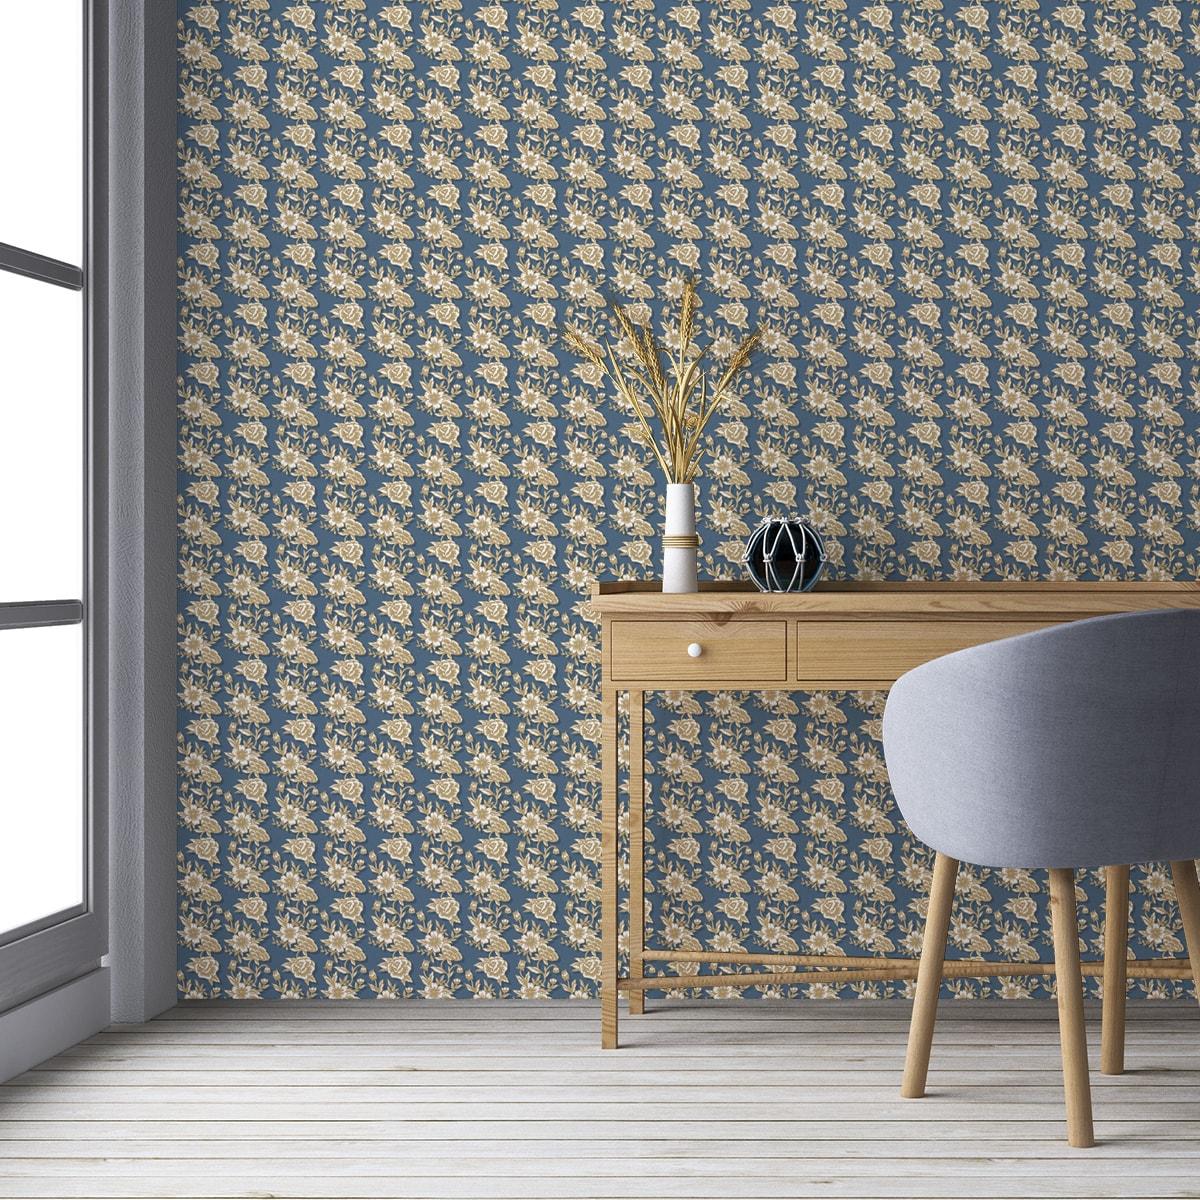 "Edle Blümchen Tapete ""Les fleurs du chateau"", blau beige Vlies Blumentapete, Wohnakzent, Wanddeko für Flur, Büro"